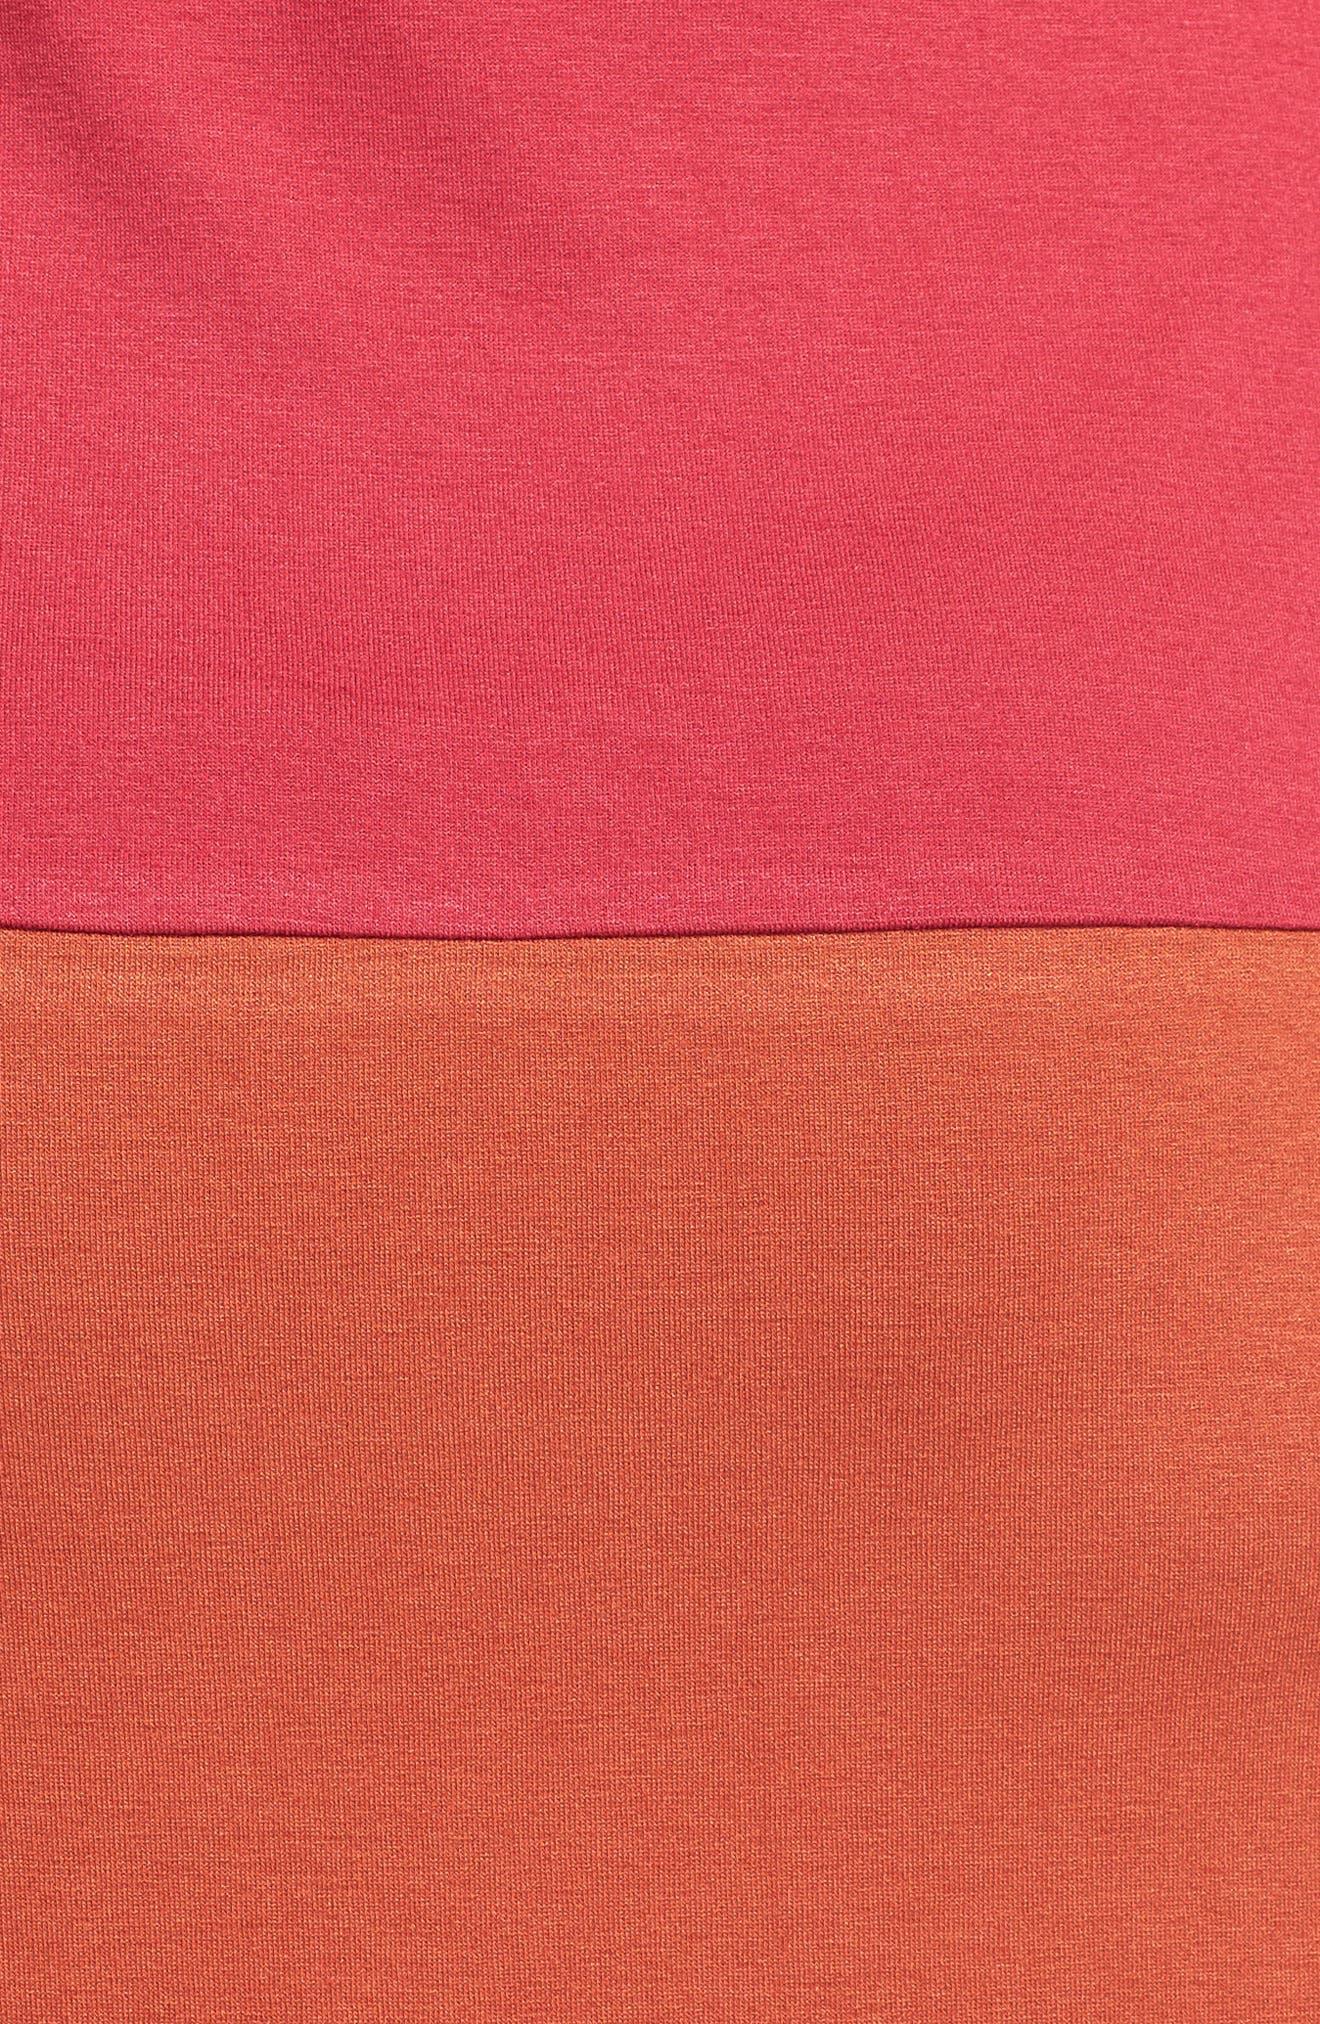 Keyhole Maternity Dress,                             Alternate thumbnail 5, color,                             BURGUNDY/ RUST